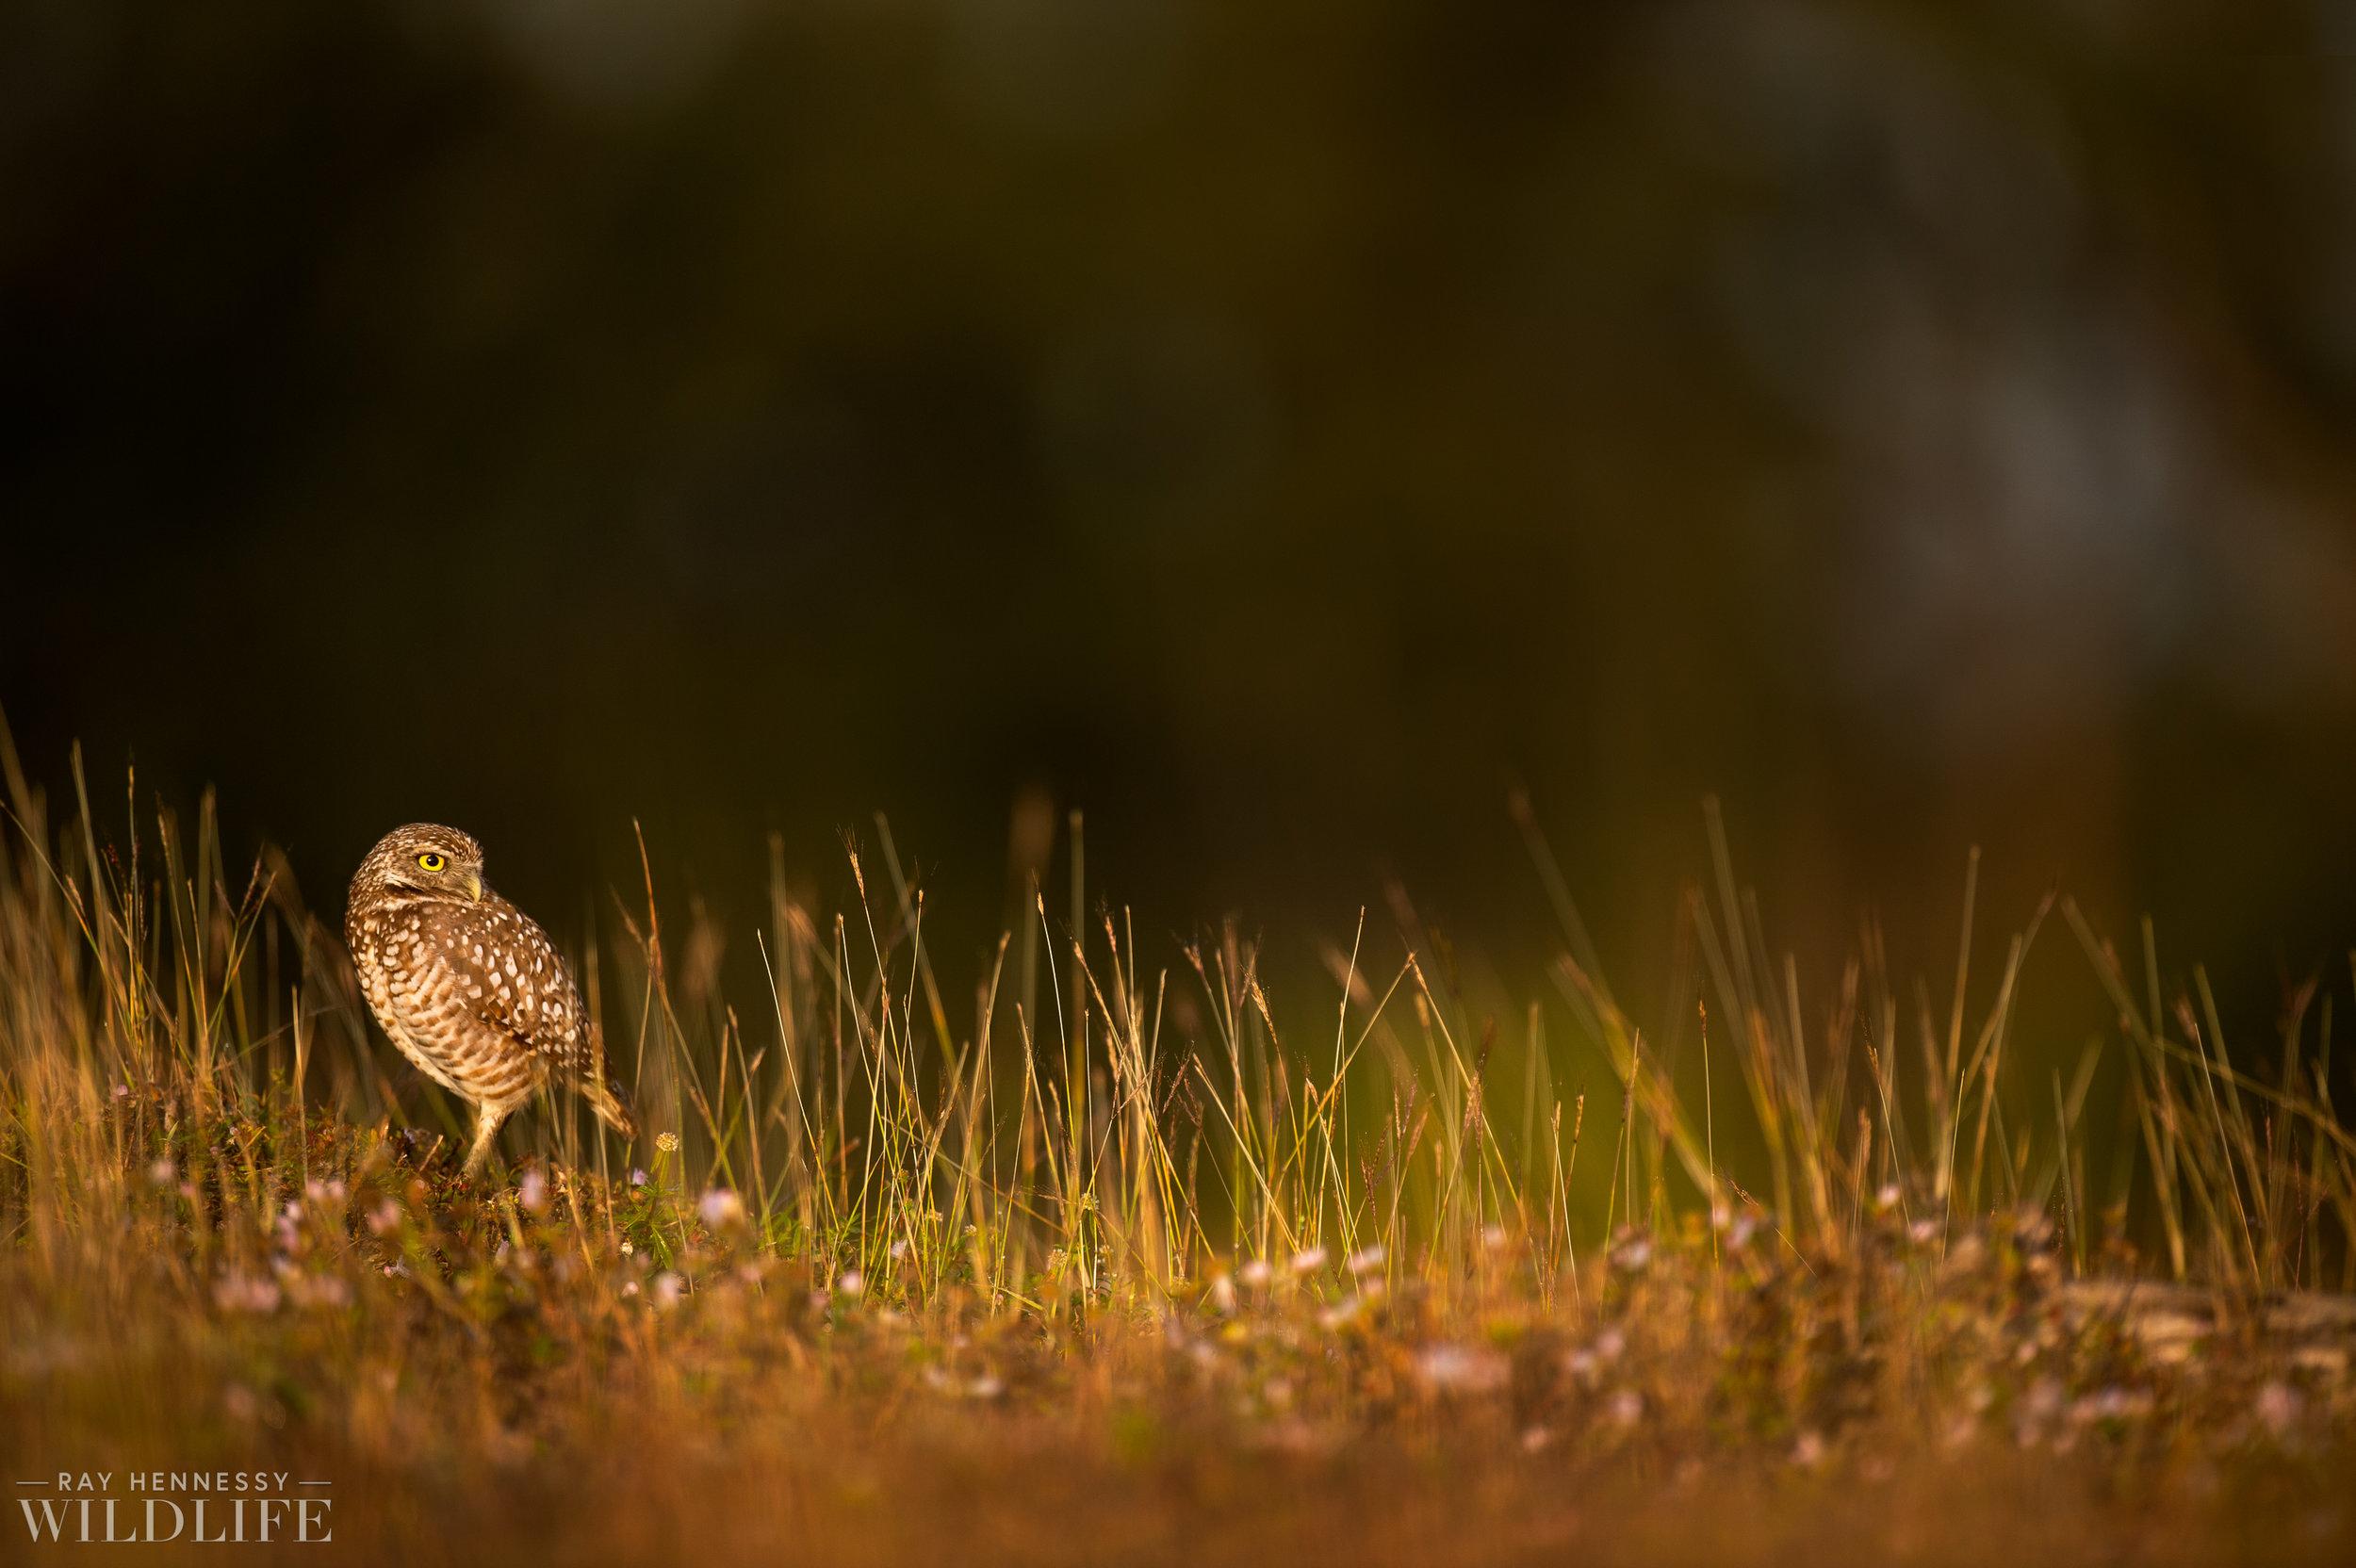 009_burrowing-owls-blue-heron-florida.jpg